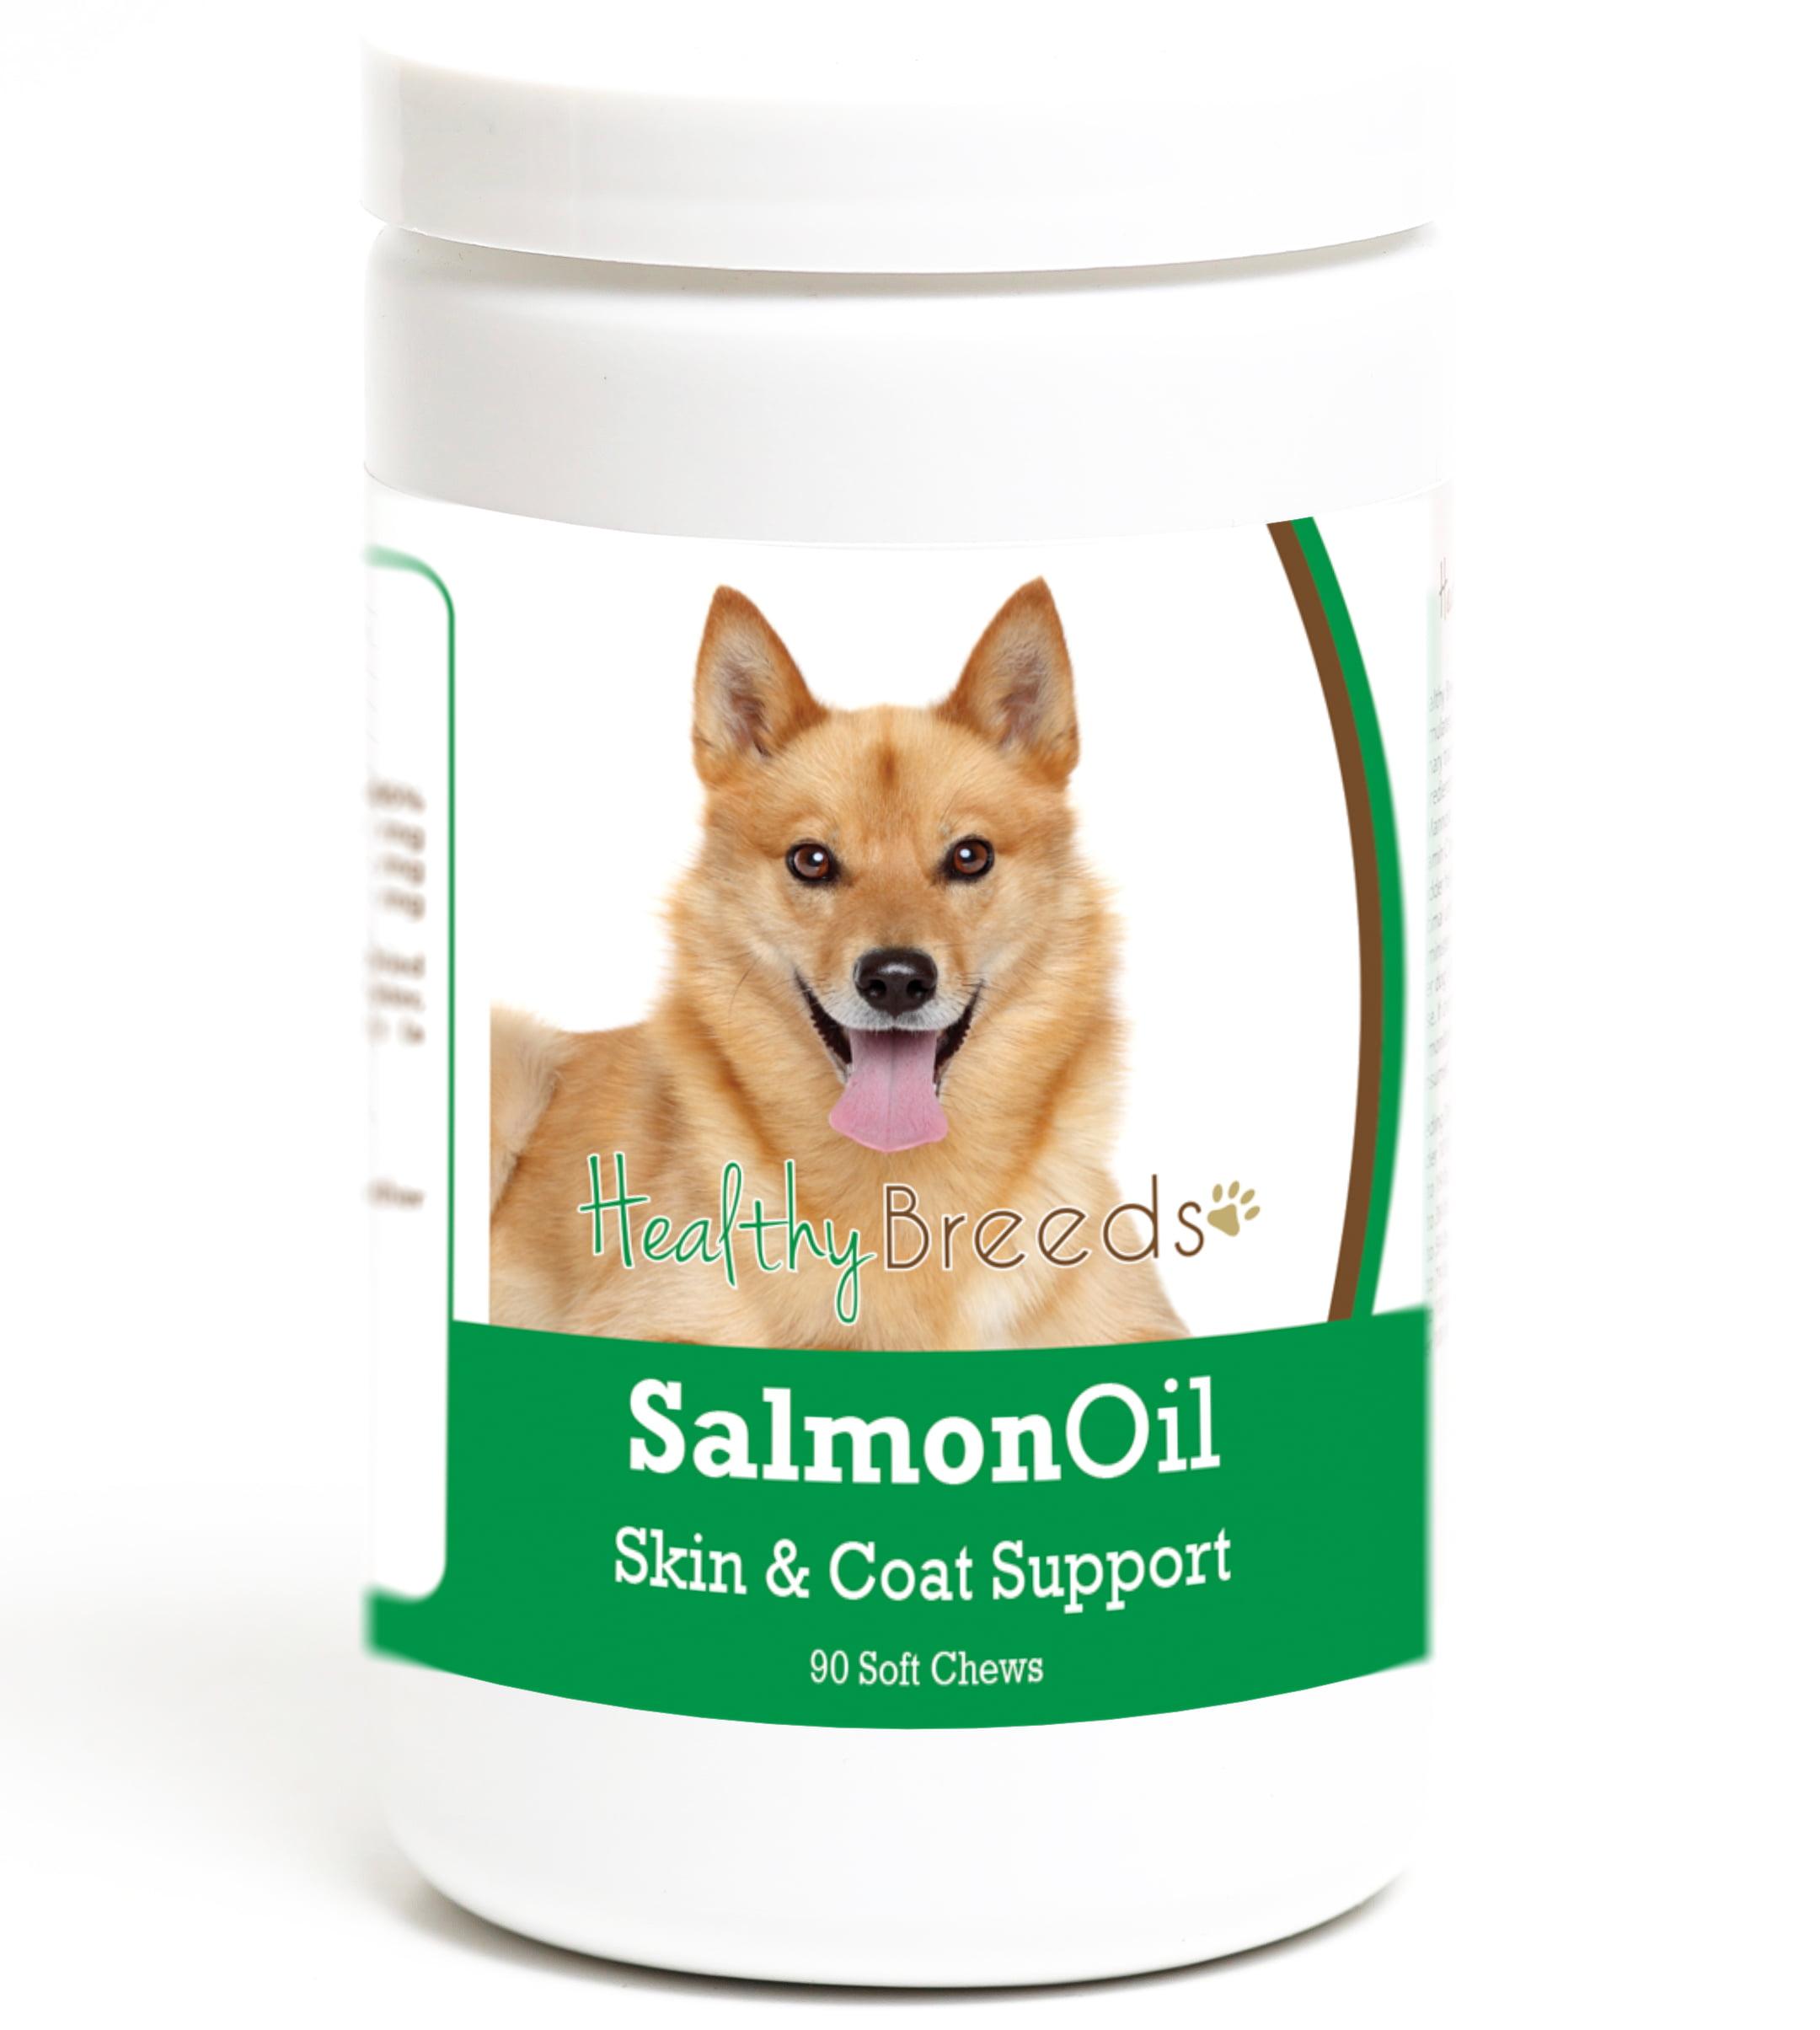 Healthy Breeds Finnish Spitz Salmon Oil Soft Chews 90 Count